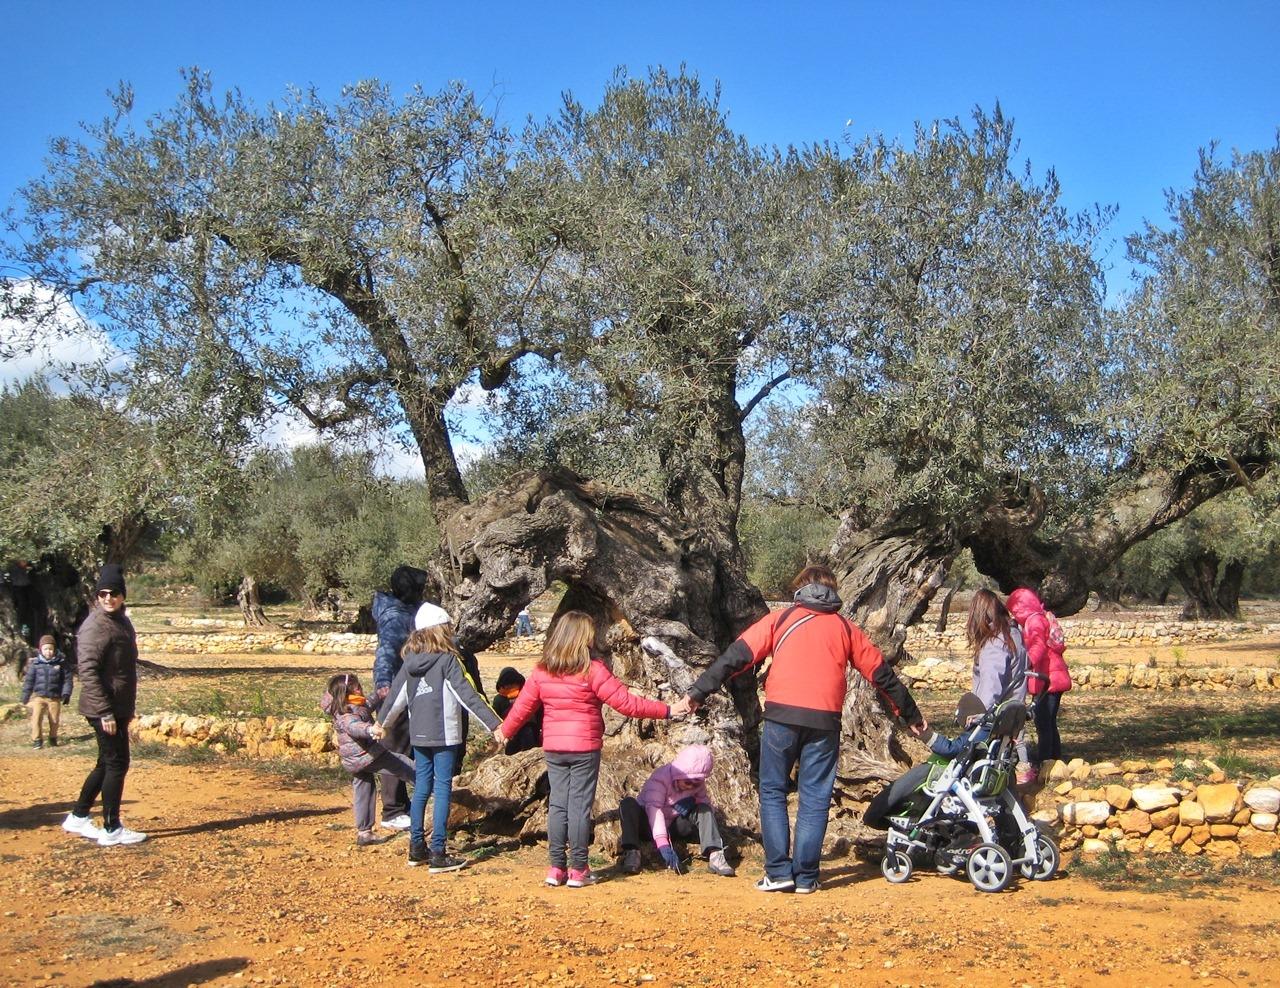 aceite oliva olivos milenarios castellon